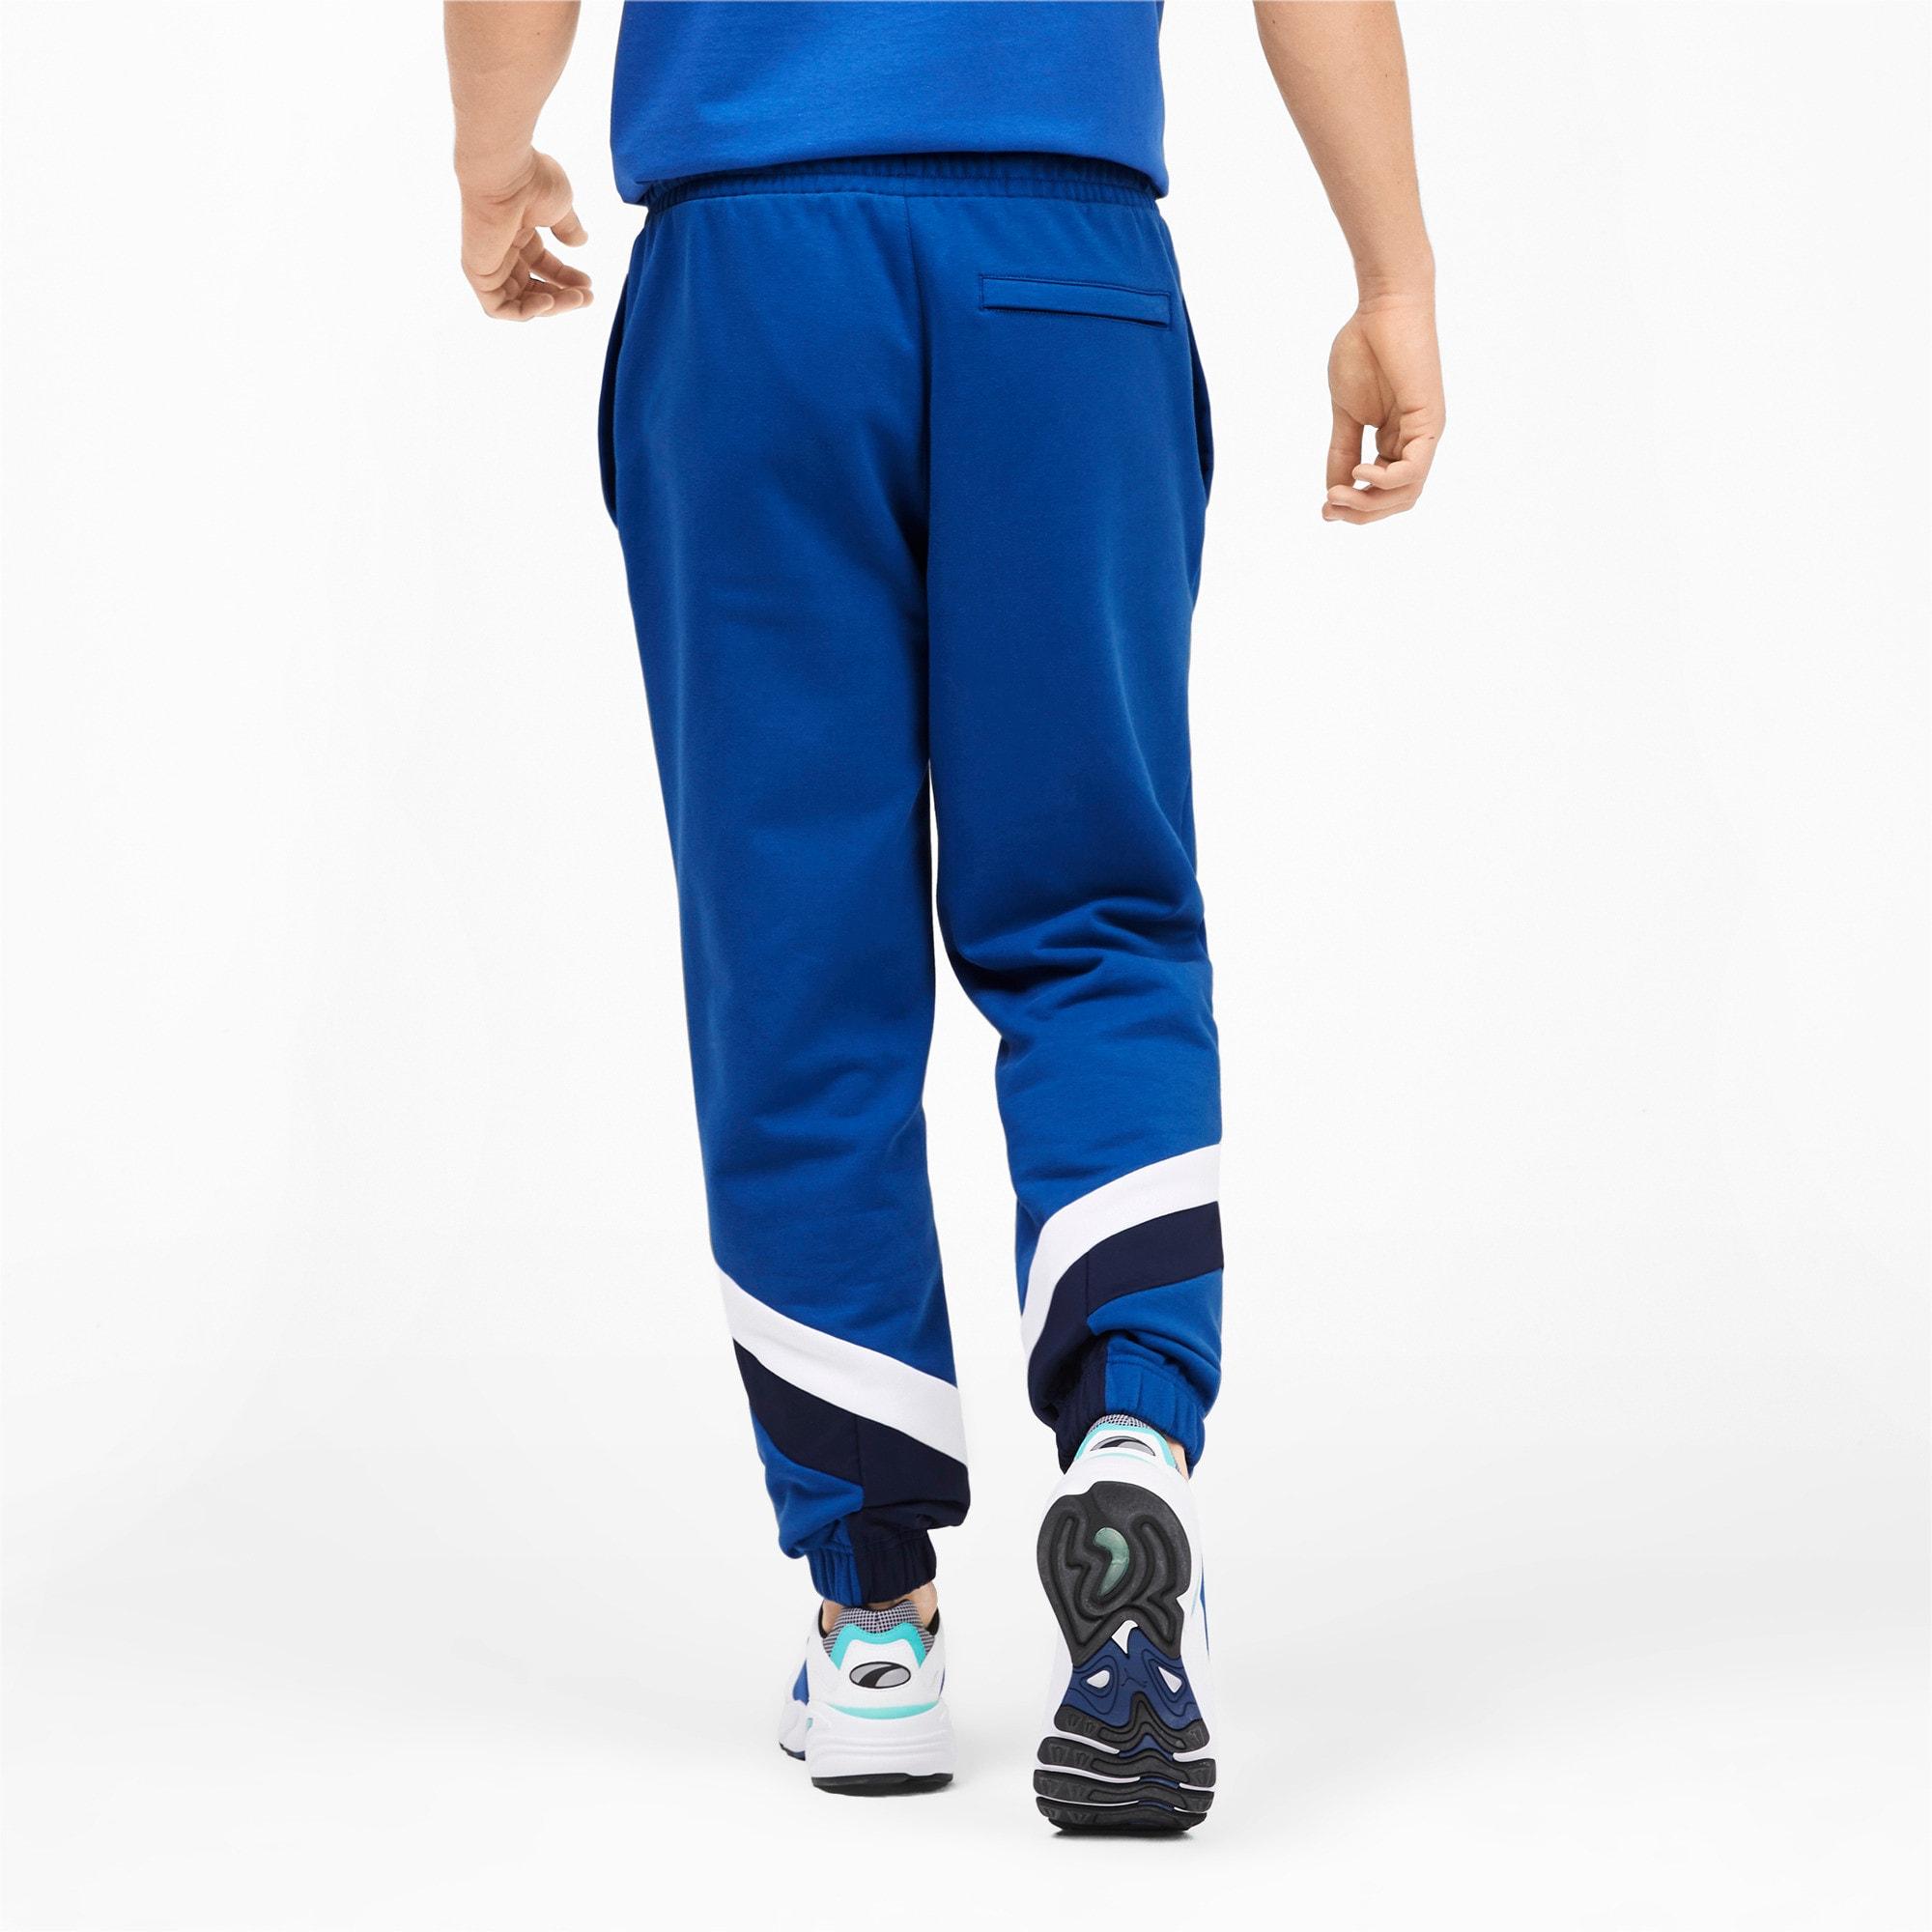 Thumbnail 3 of Iconic MCS Men's Track Pants, Galaxy Blue, medium